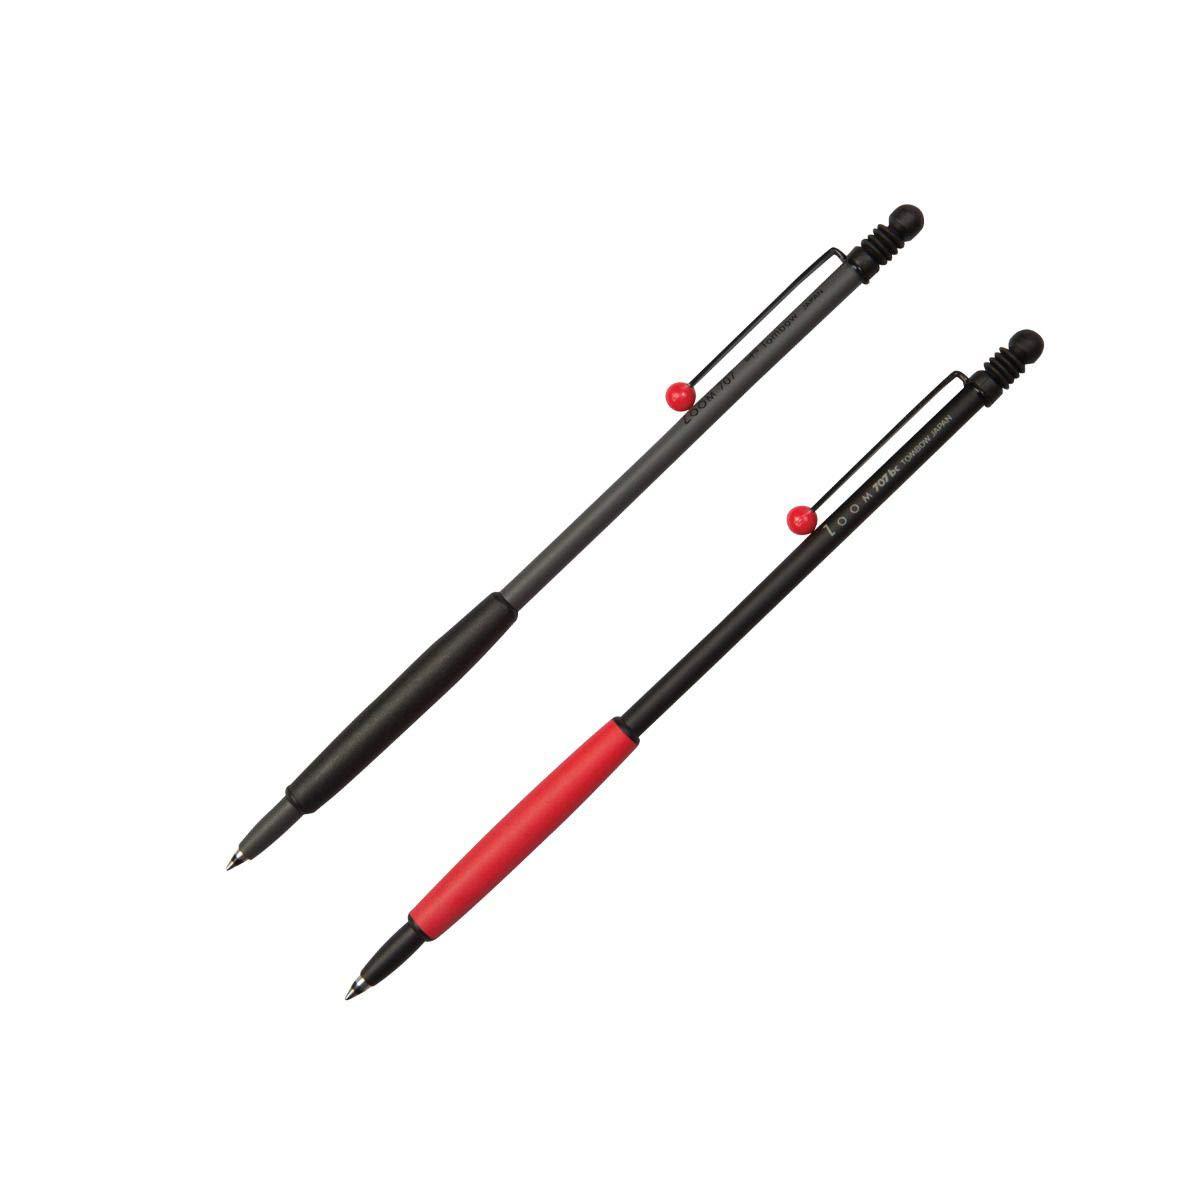 Tombow Ballpoint Pen Zoom707 Gray//Black